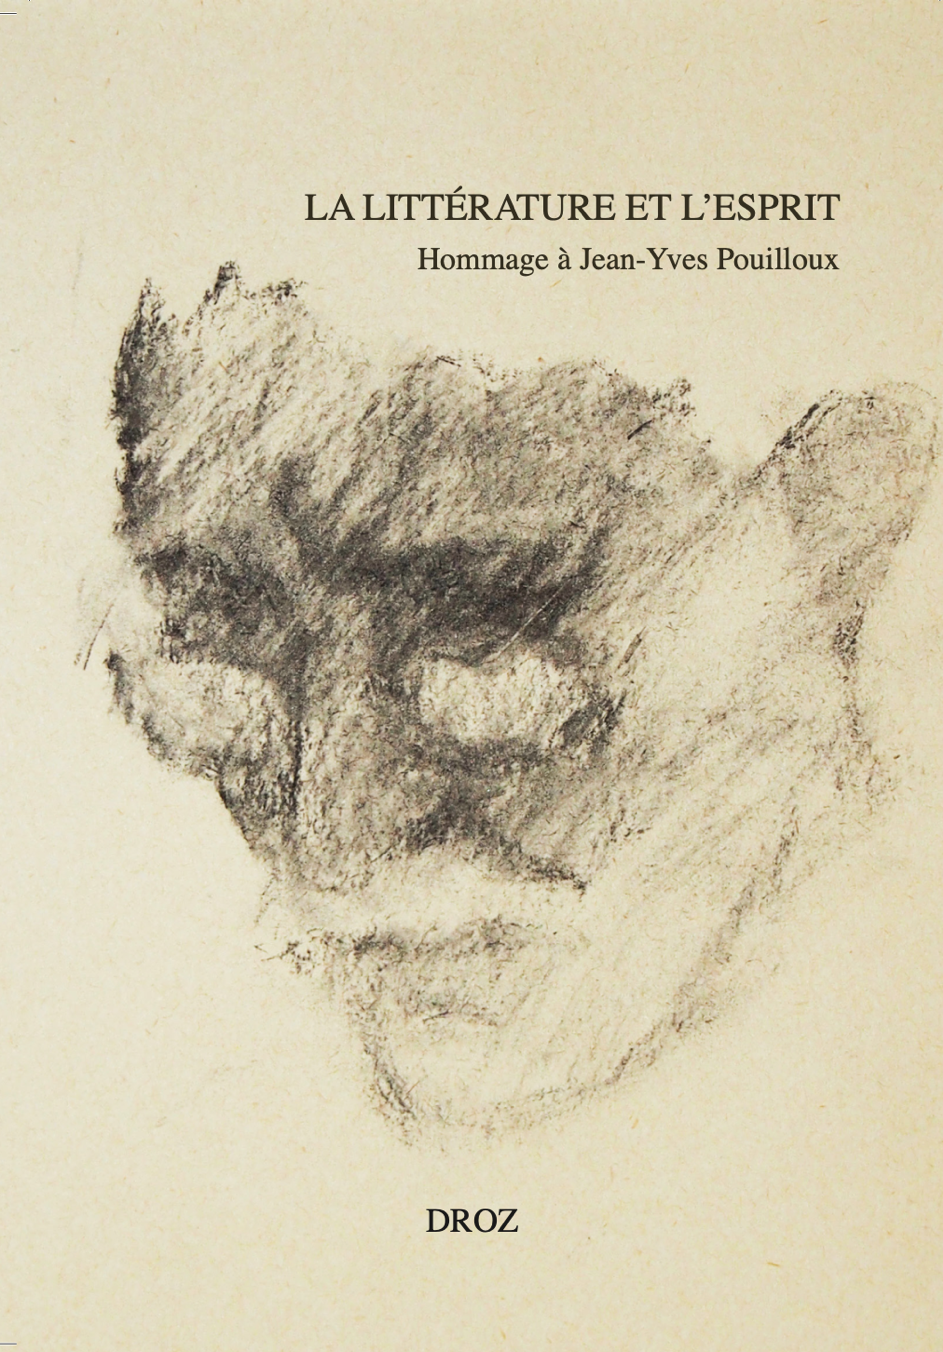 Hommage à Jean-Yves Pouilloux (Paris, Librairie Tschann)